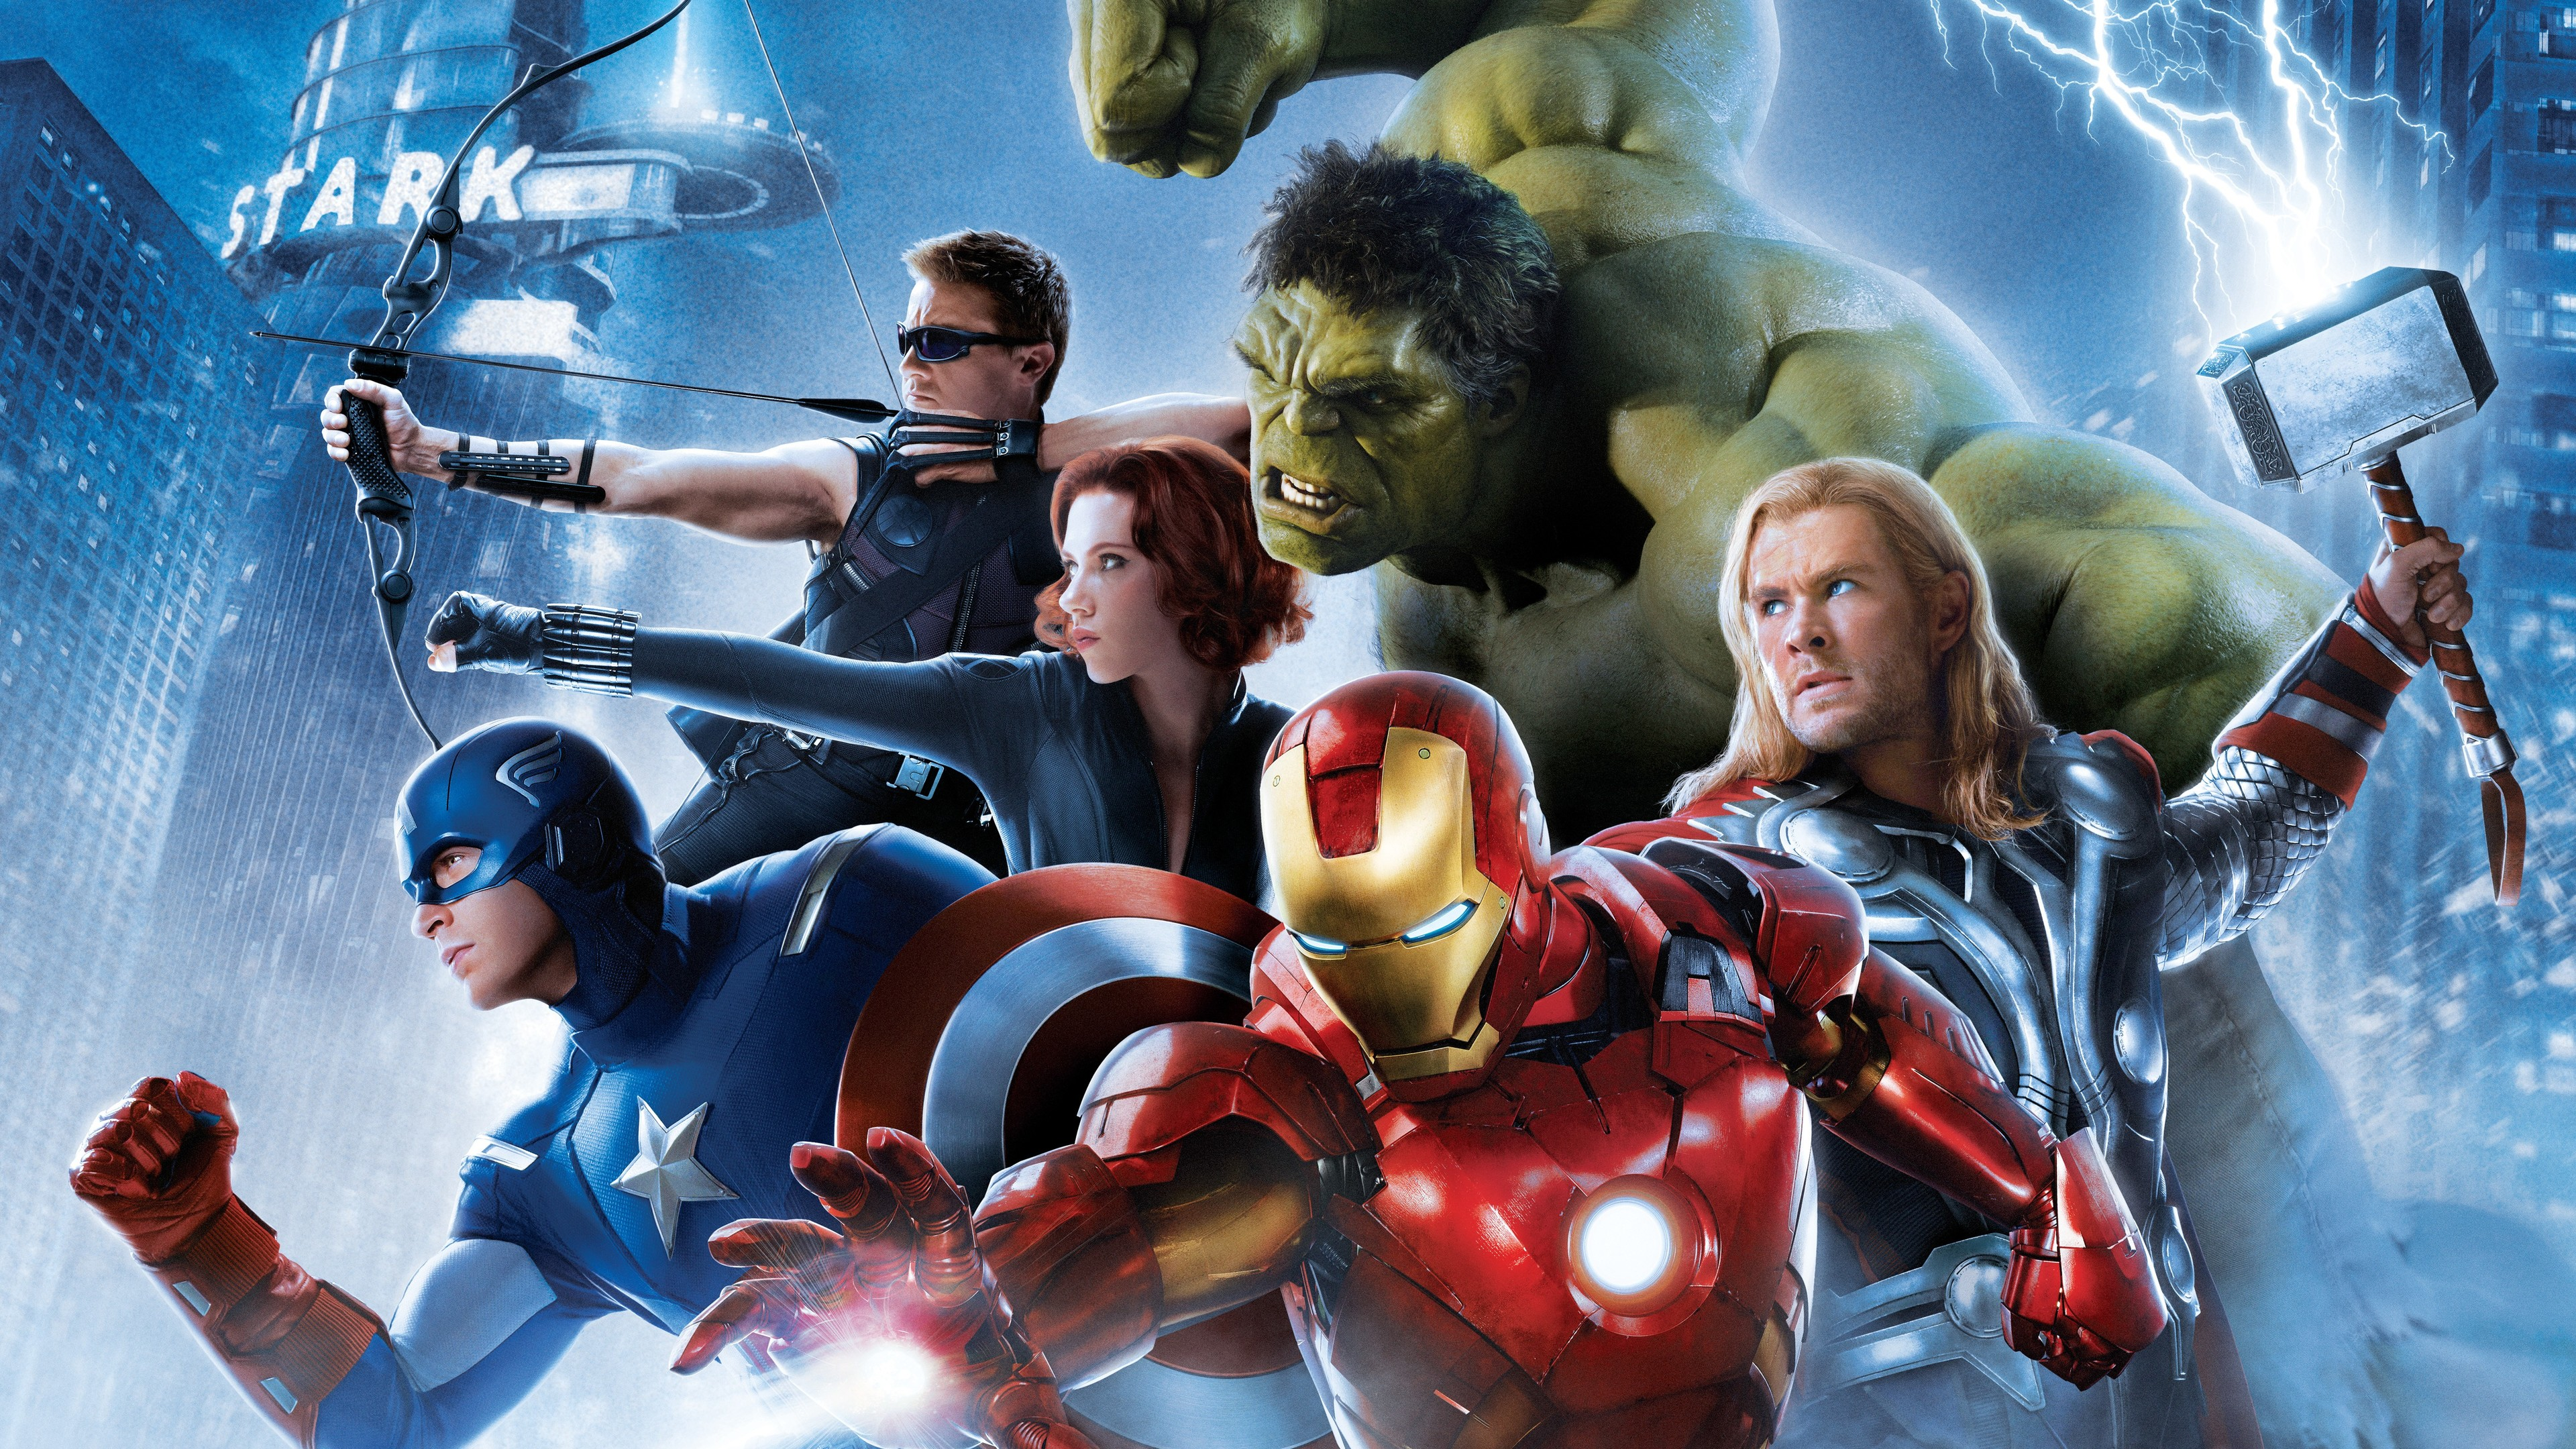 iron man thor captain america black widow hawkeye 1536521571 - Iron Man Thor Captain America Black Widow Hawkeye - thor wallpapers, superheroes wallpapers, iron man wallpapers, hd-wallpapers, hawkeye wallpapers, captain america wallpapers, black widow wallpapers, 5k wallpapers, 4k-wallpapers